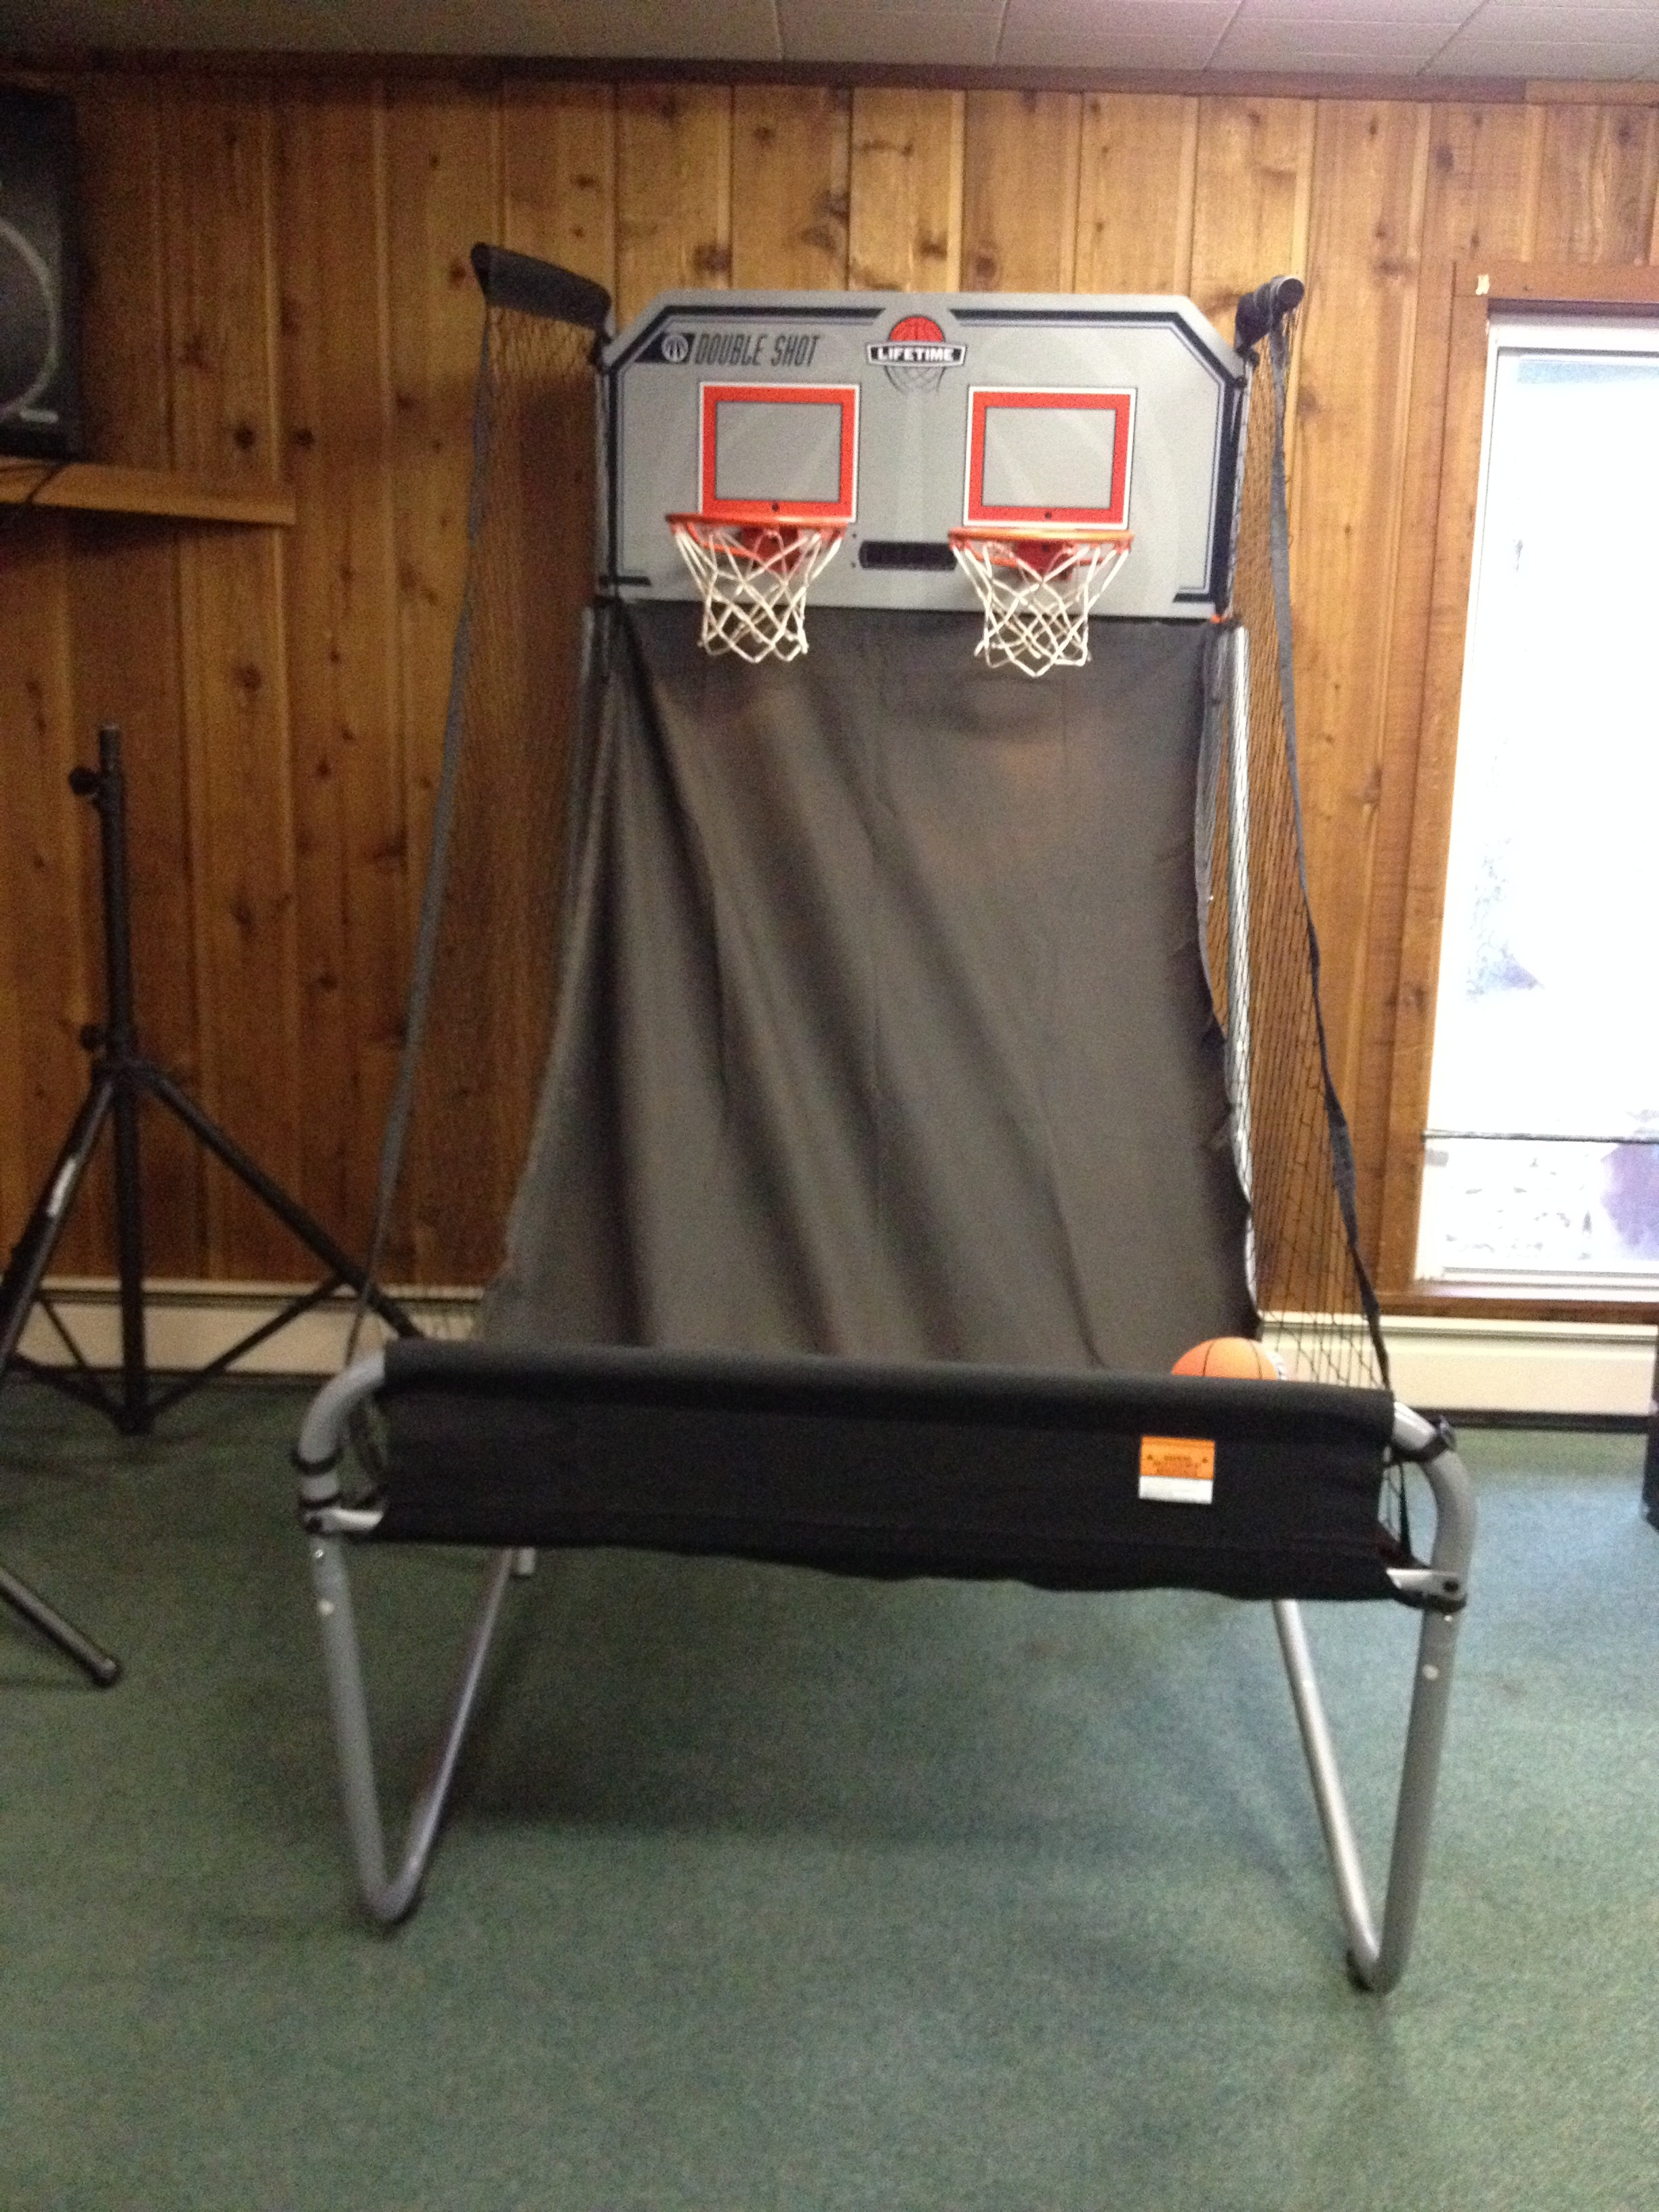 New Basketball 2 shooter (1).JPG